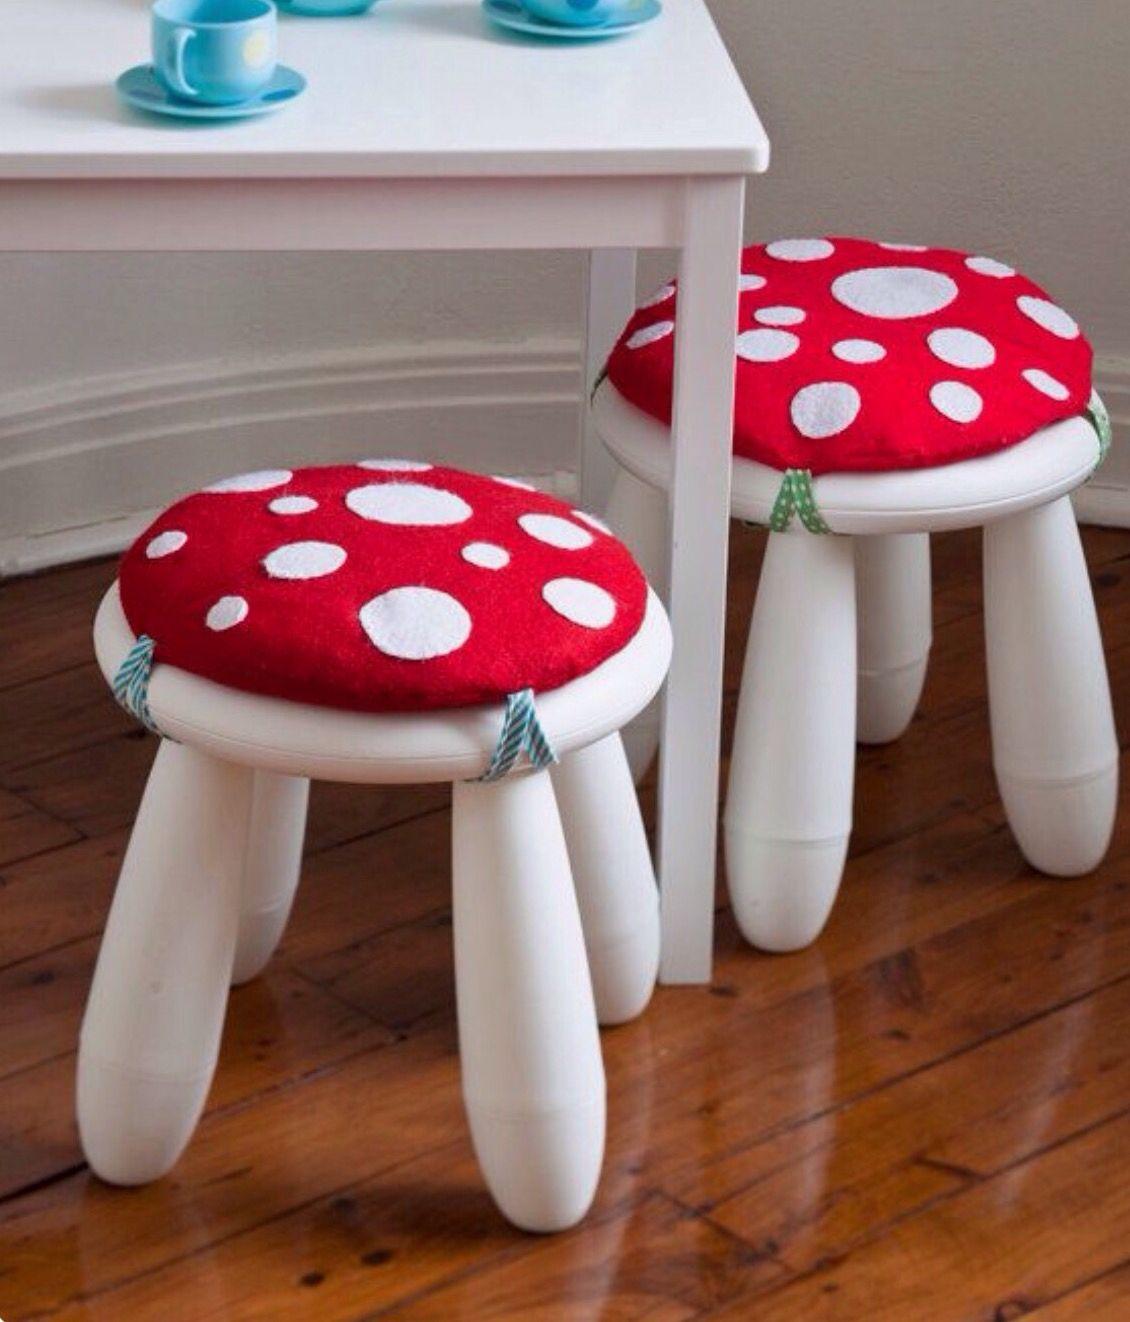 Taburete casa pinterest muebles ni os y infantiles - Taburete ninos ...